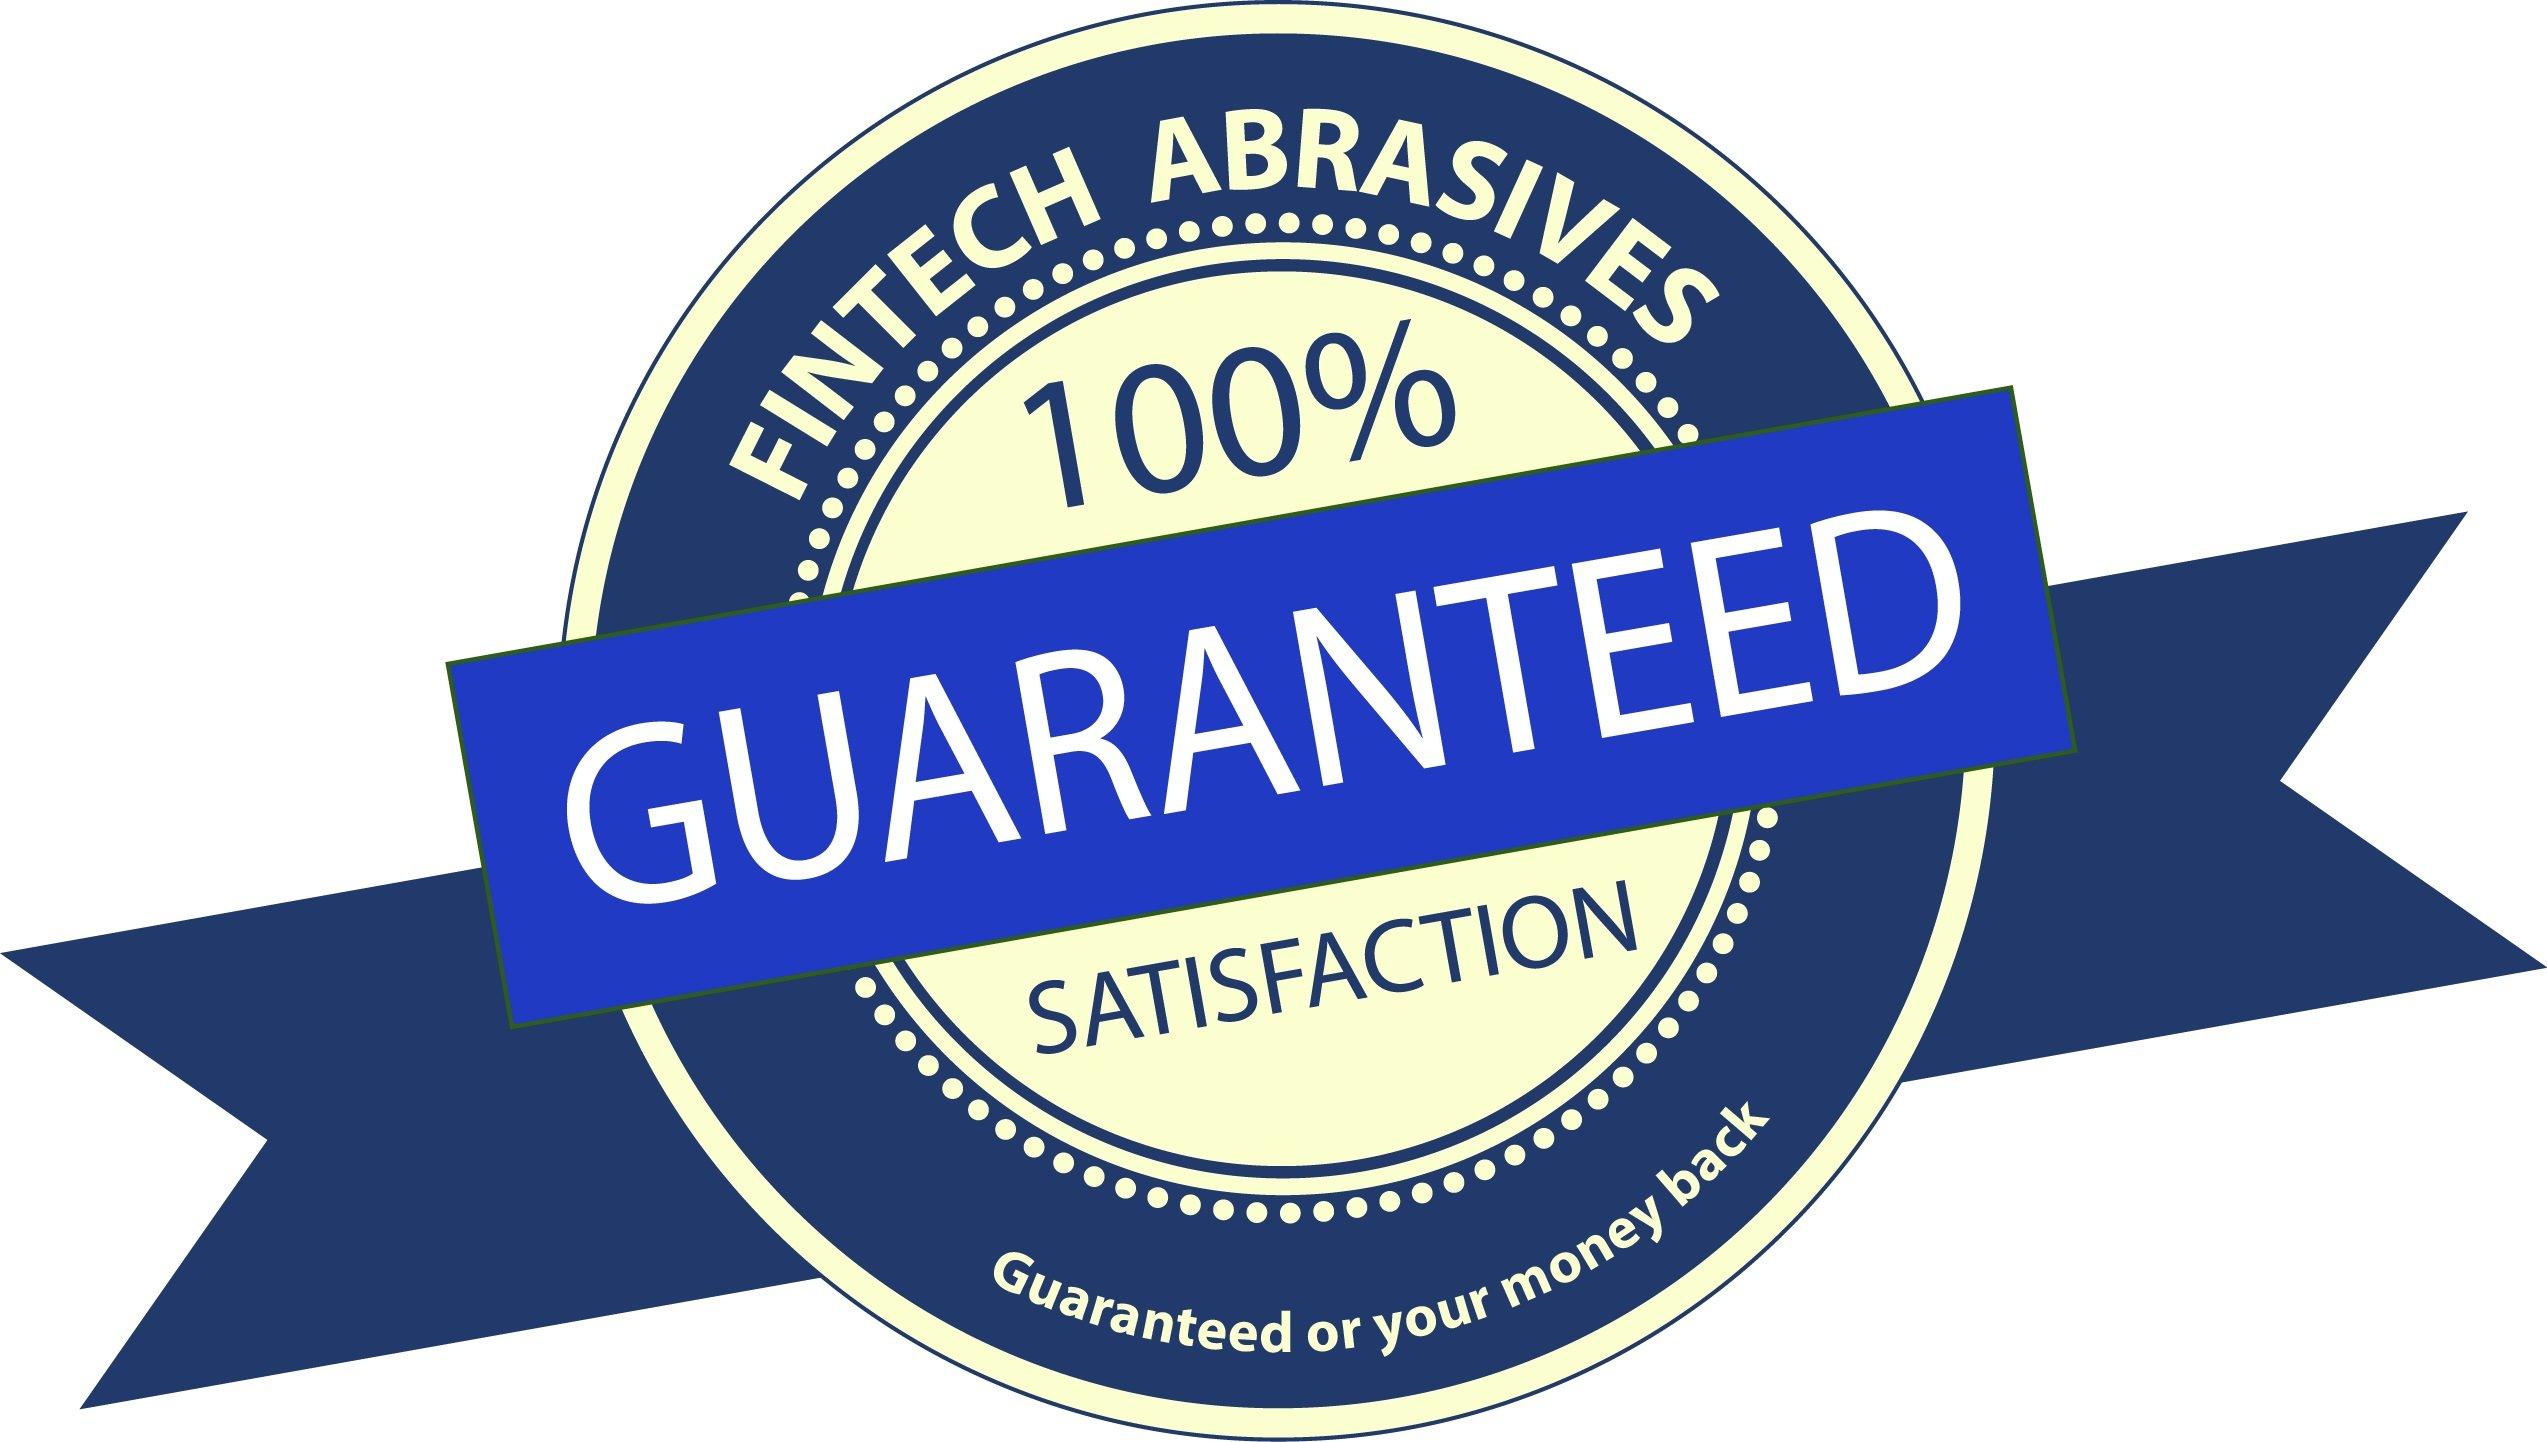 1/2 X 12 Inch 220 Grit Aluminum Oxide Air File Sanding Belts, 20 Pack by Red Label Abrasives (Image #2)